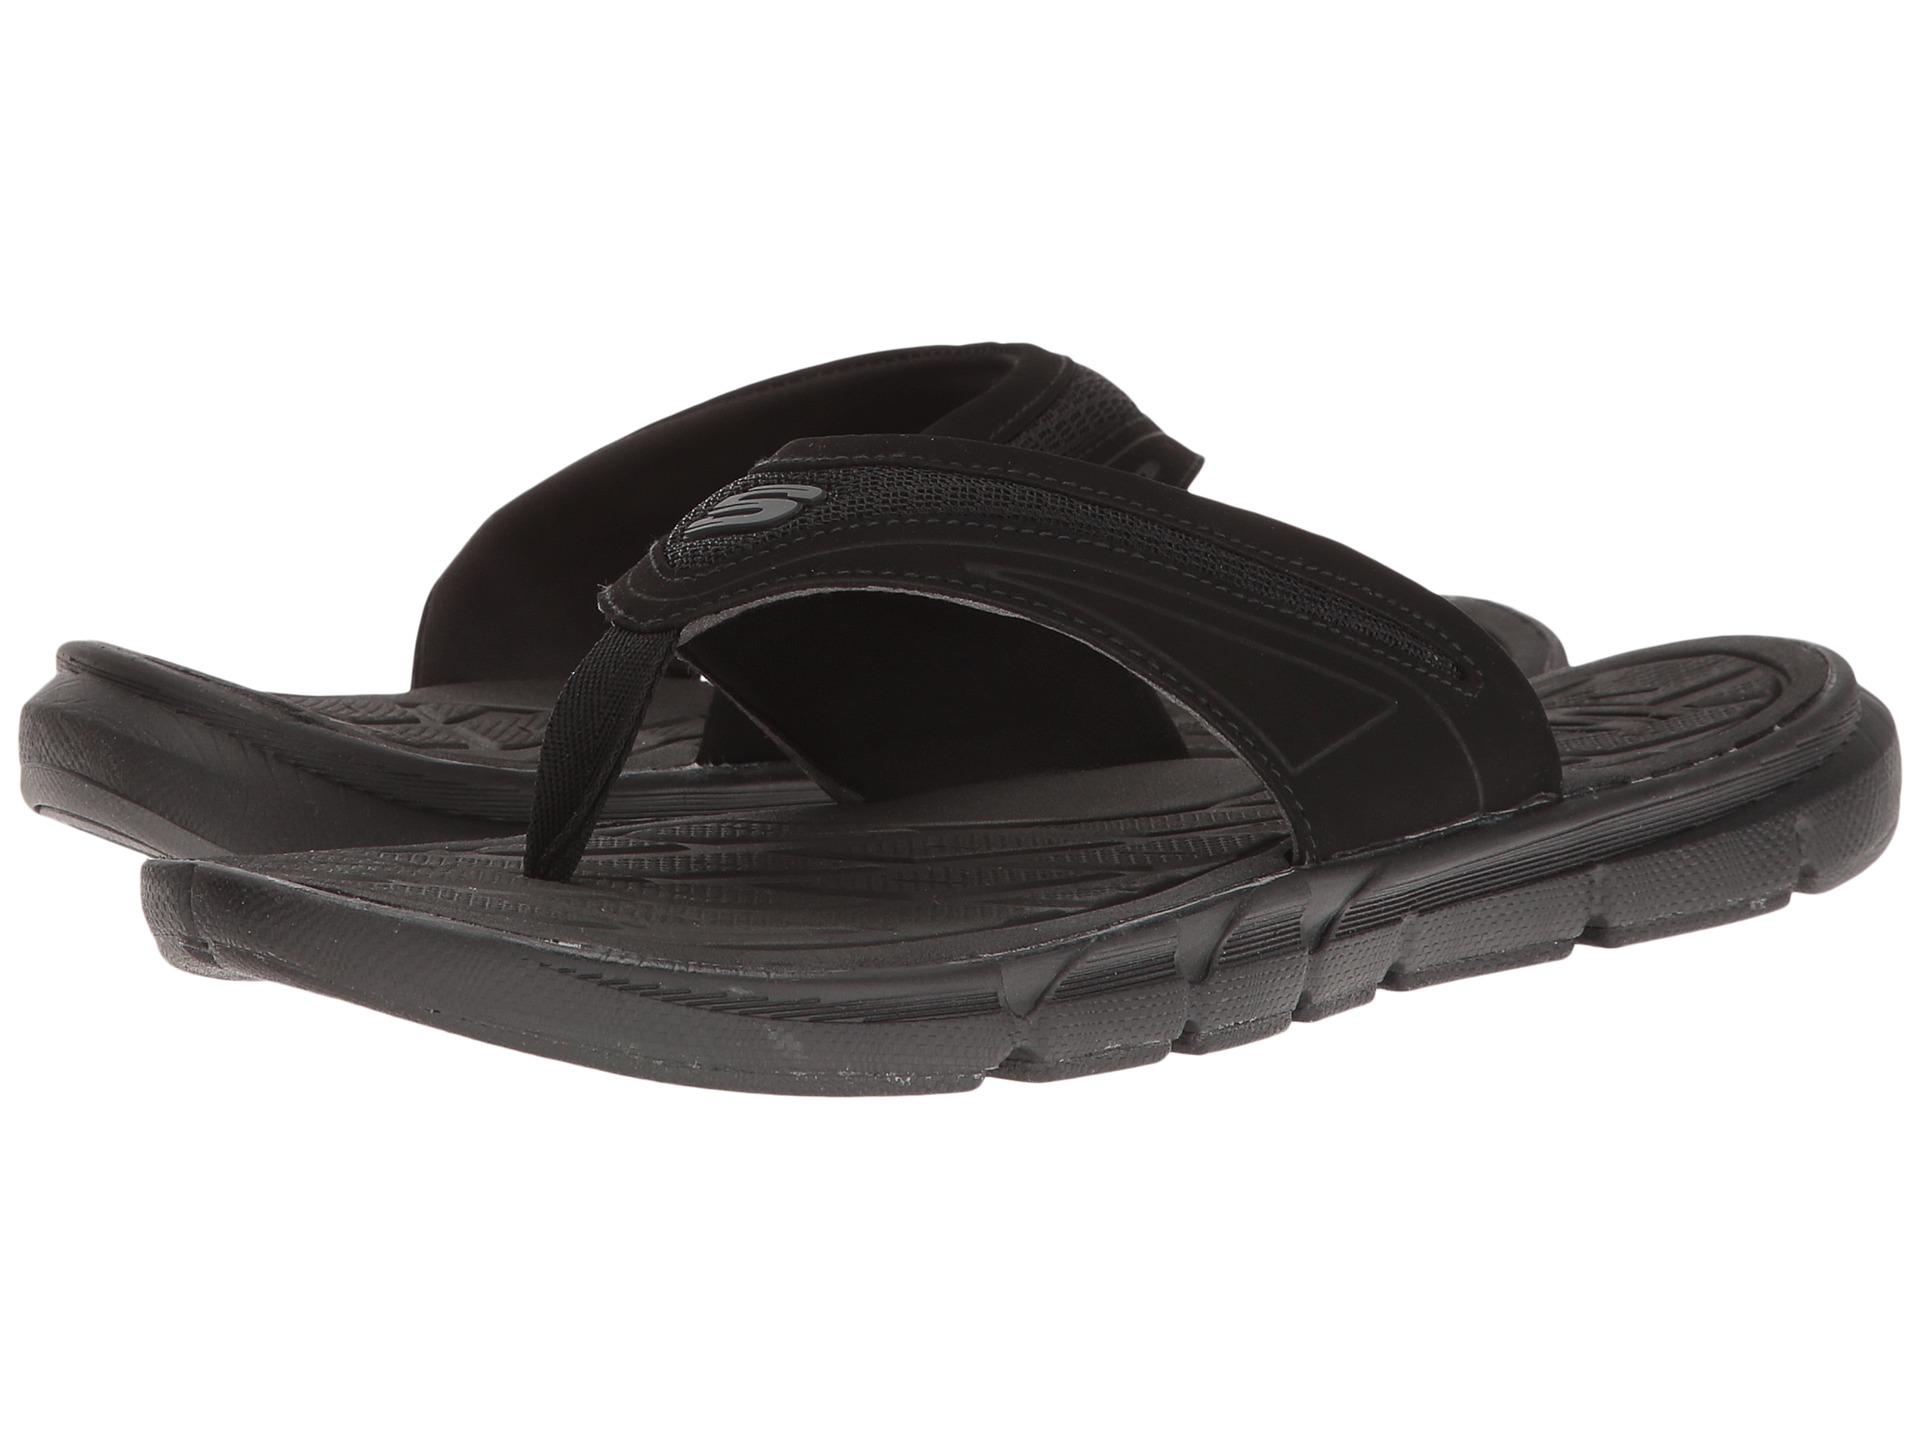 Black enclosed sandals - View More Like This Skechers Thong Sandal W Mesh